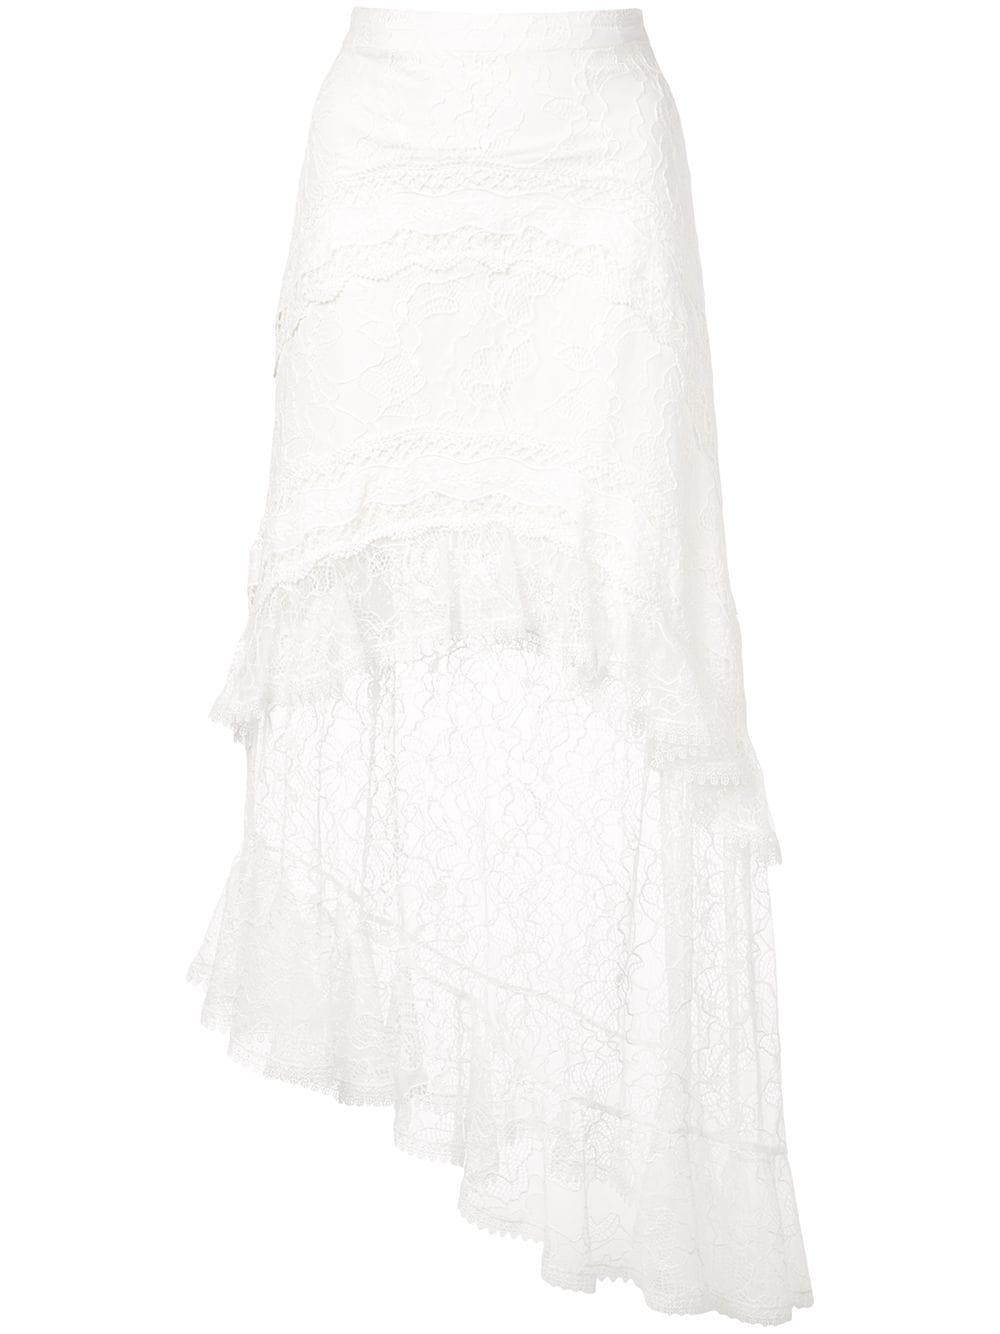 Lace Embroidered High Waist Maxi Skirt Item # FIRUZA